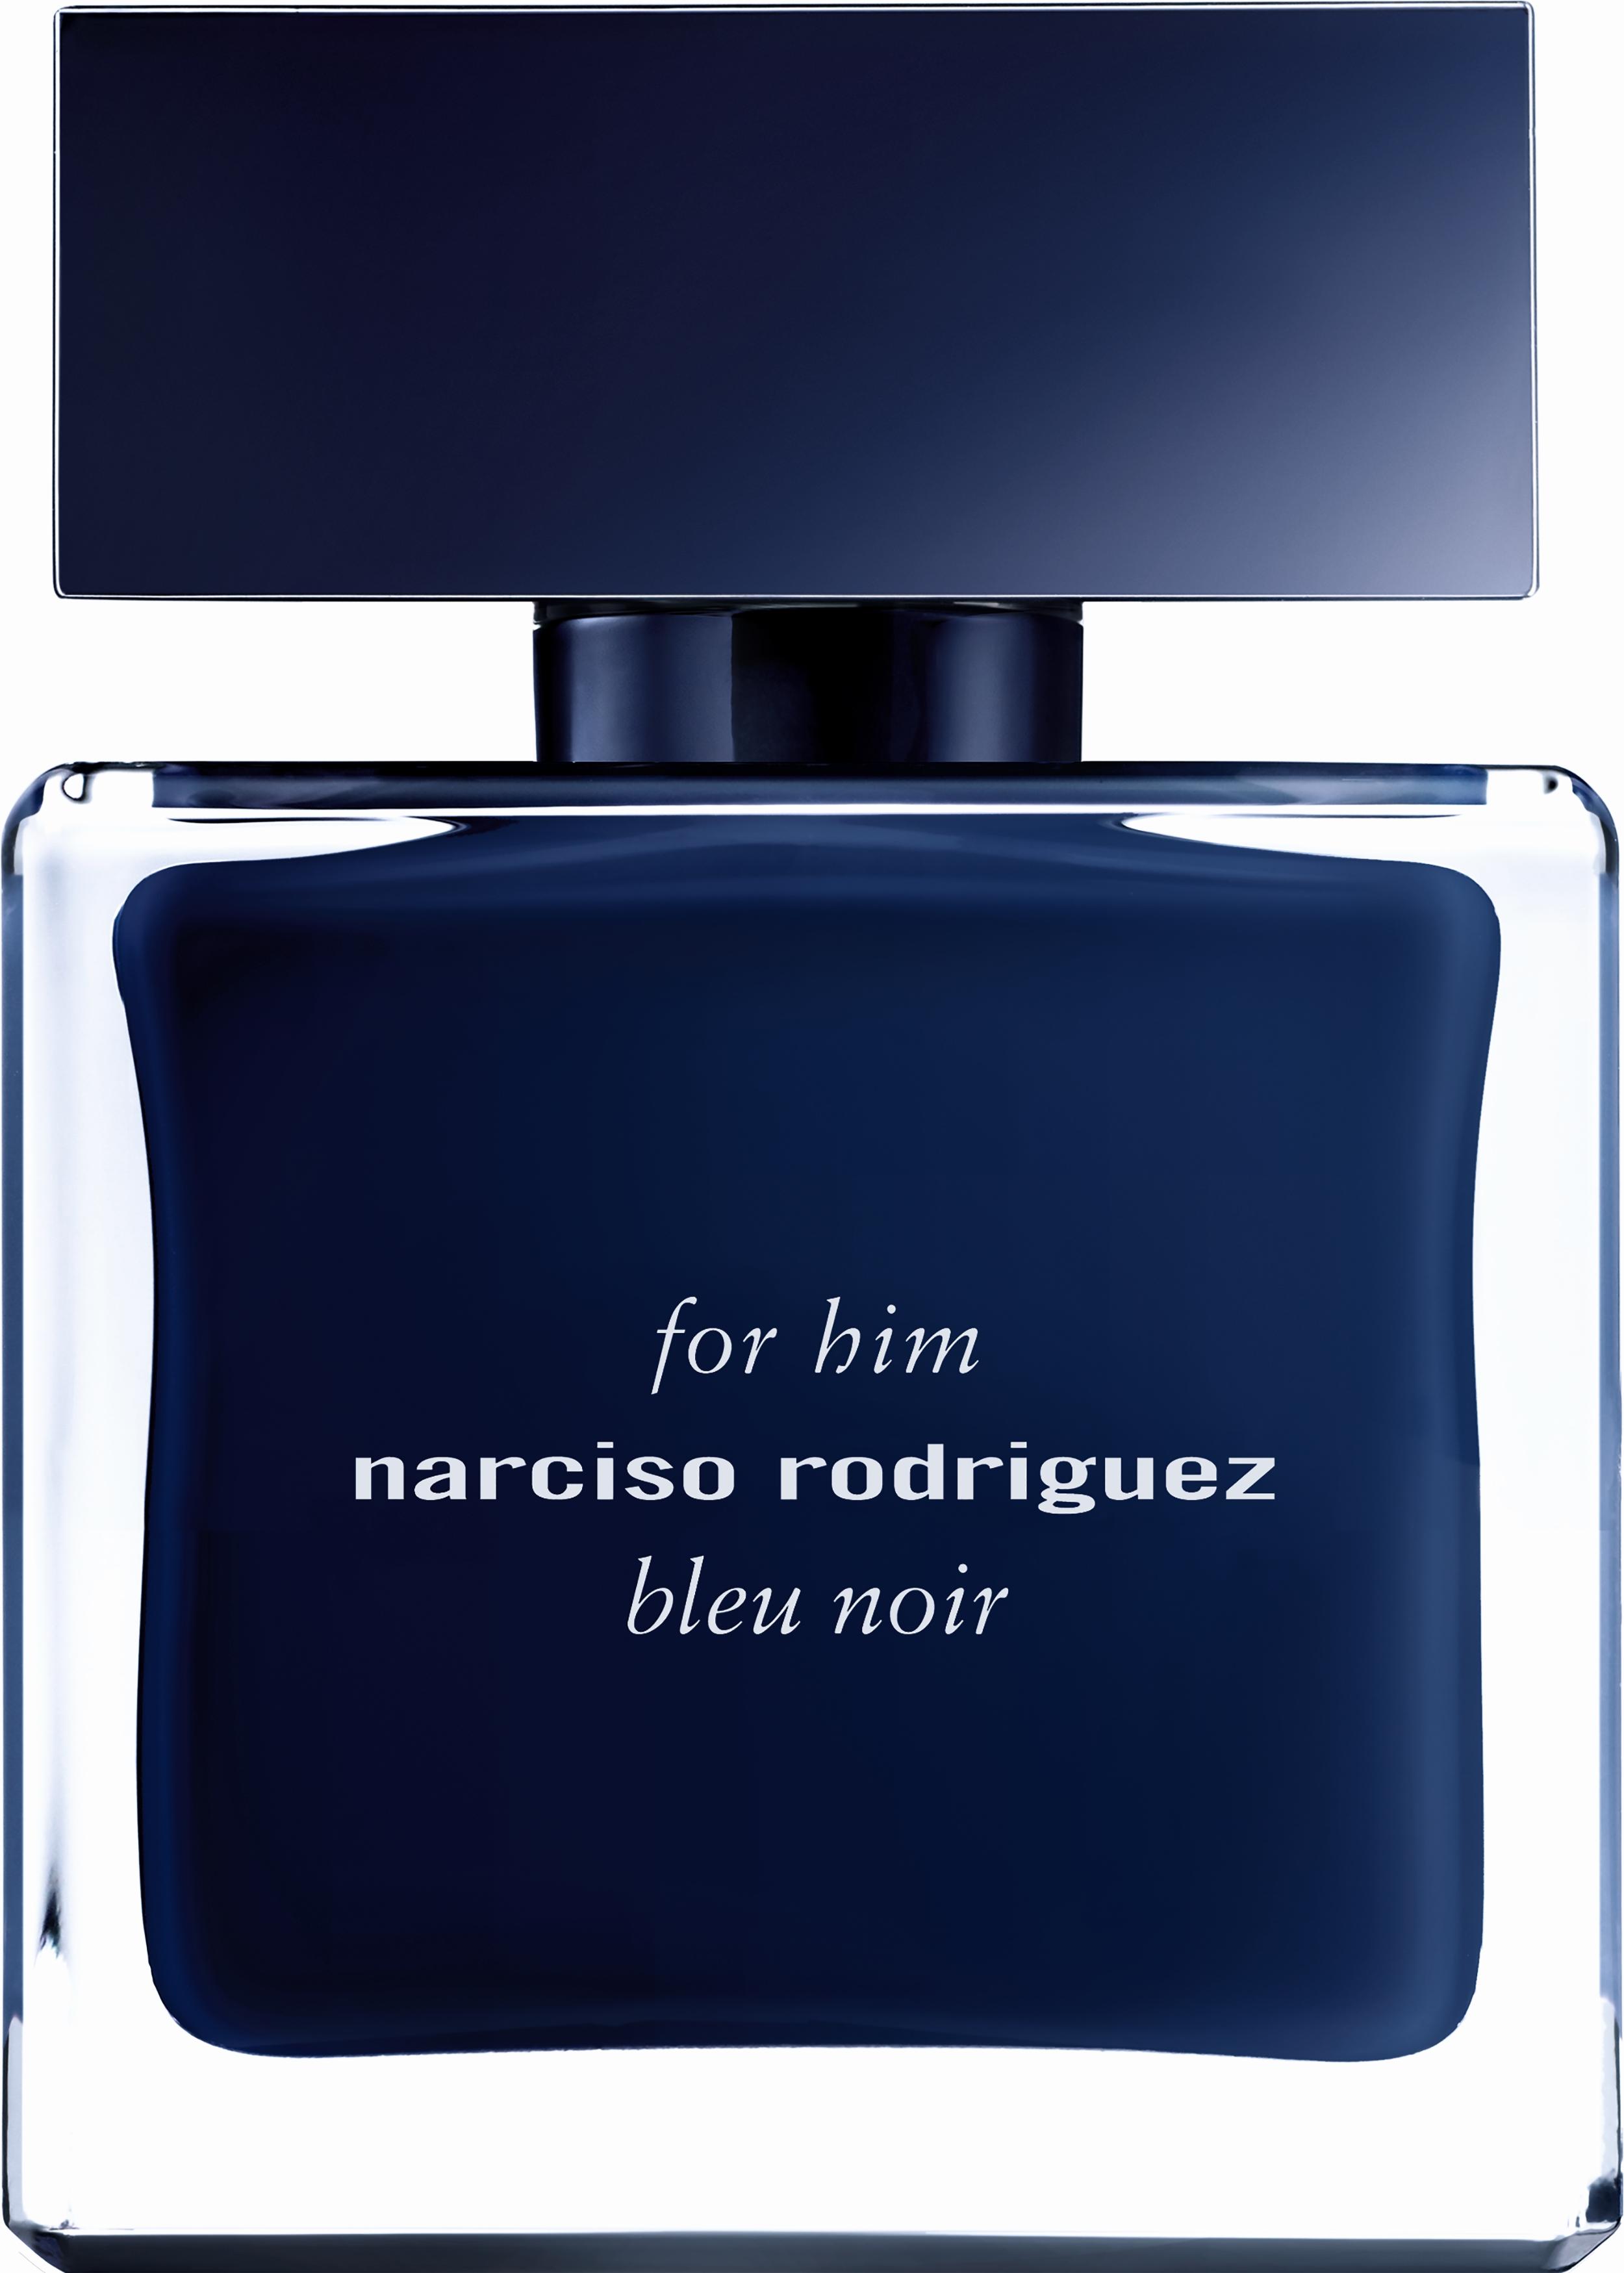 Narciso Rodriguez Bleu Noir For Him EDT, 50 ml